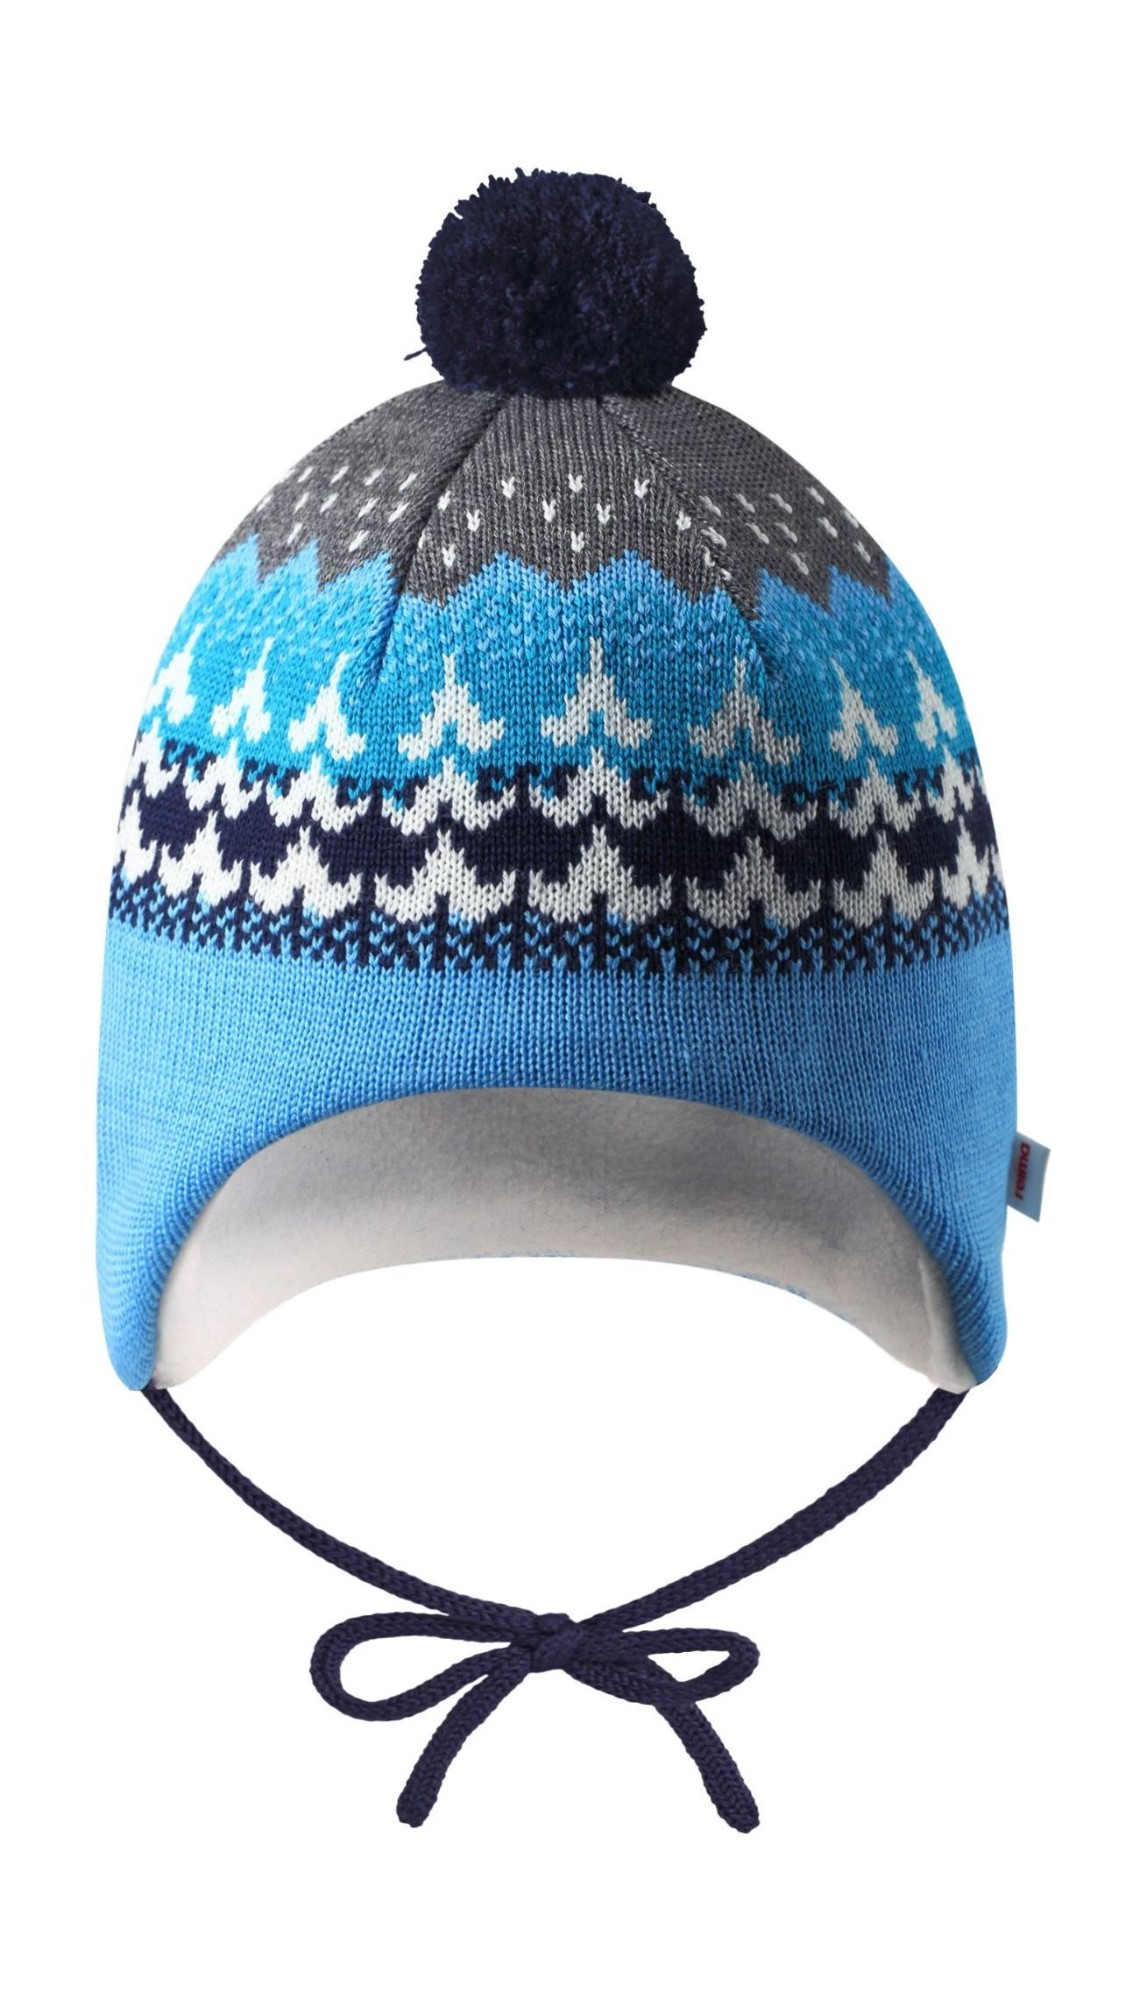 REIMA Tuittu Icy Blue 36